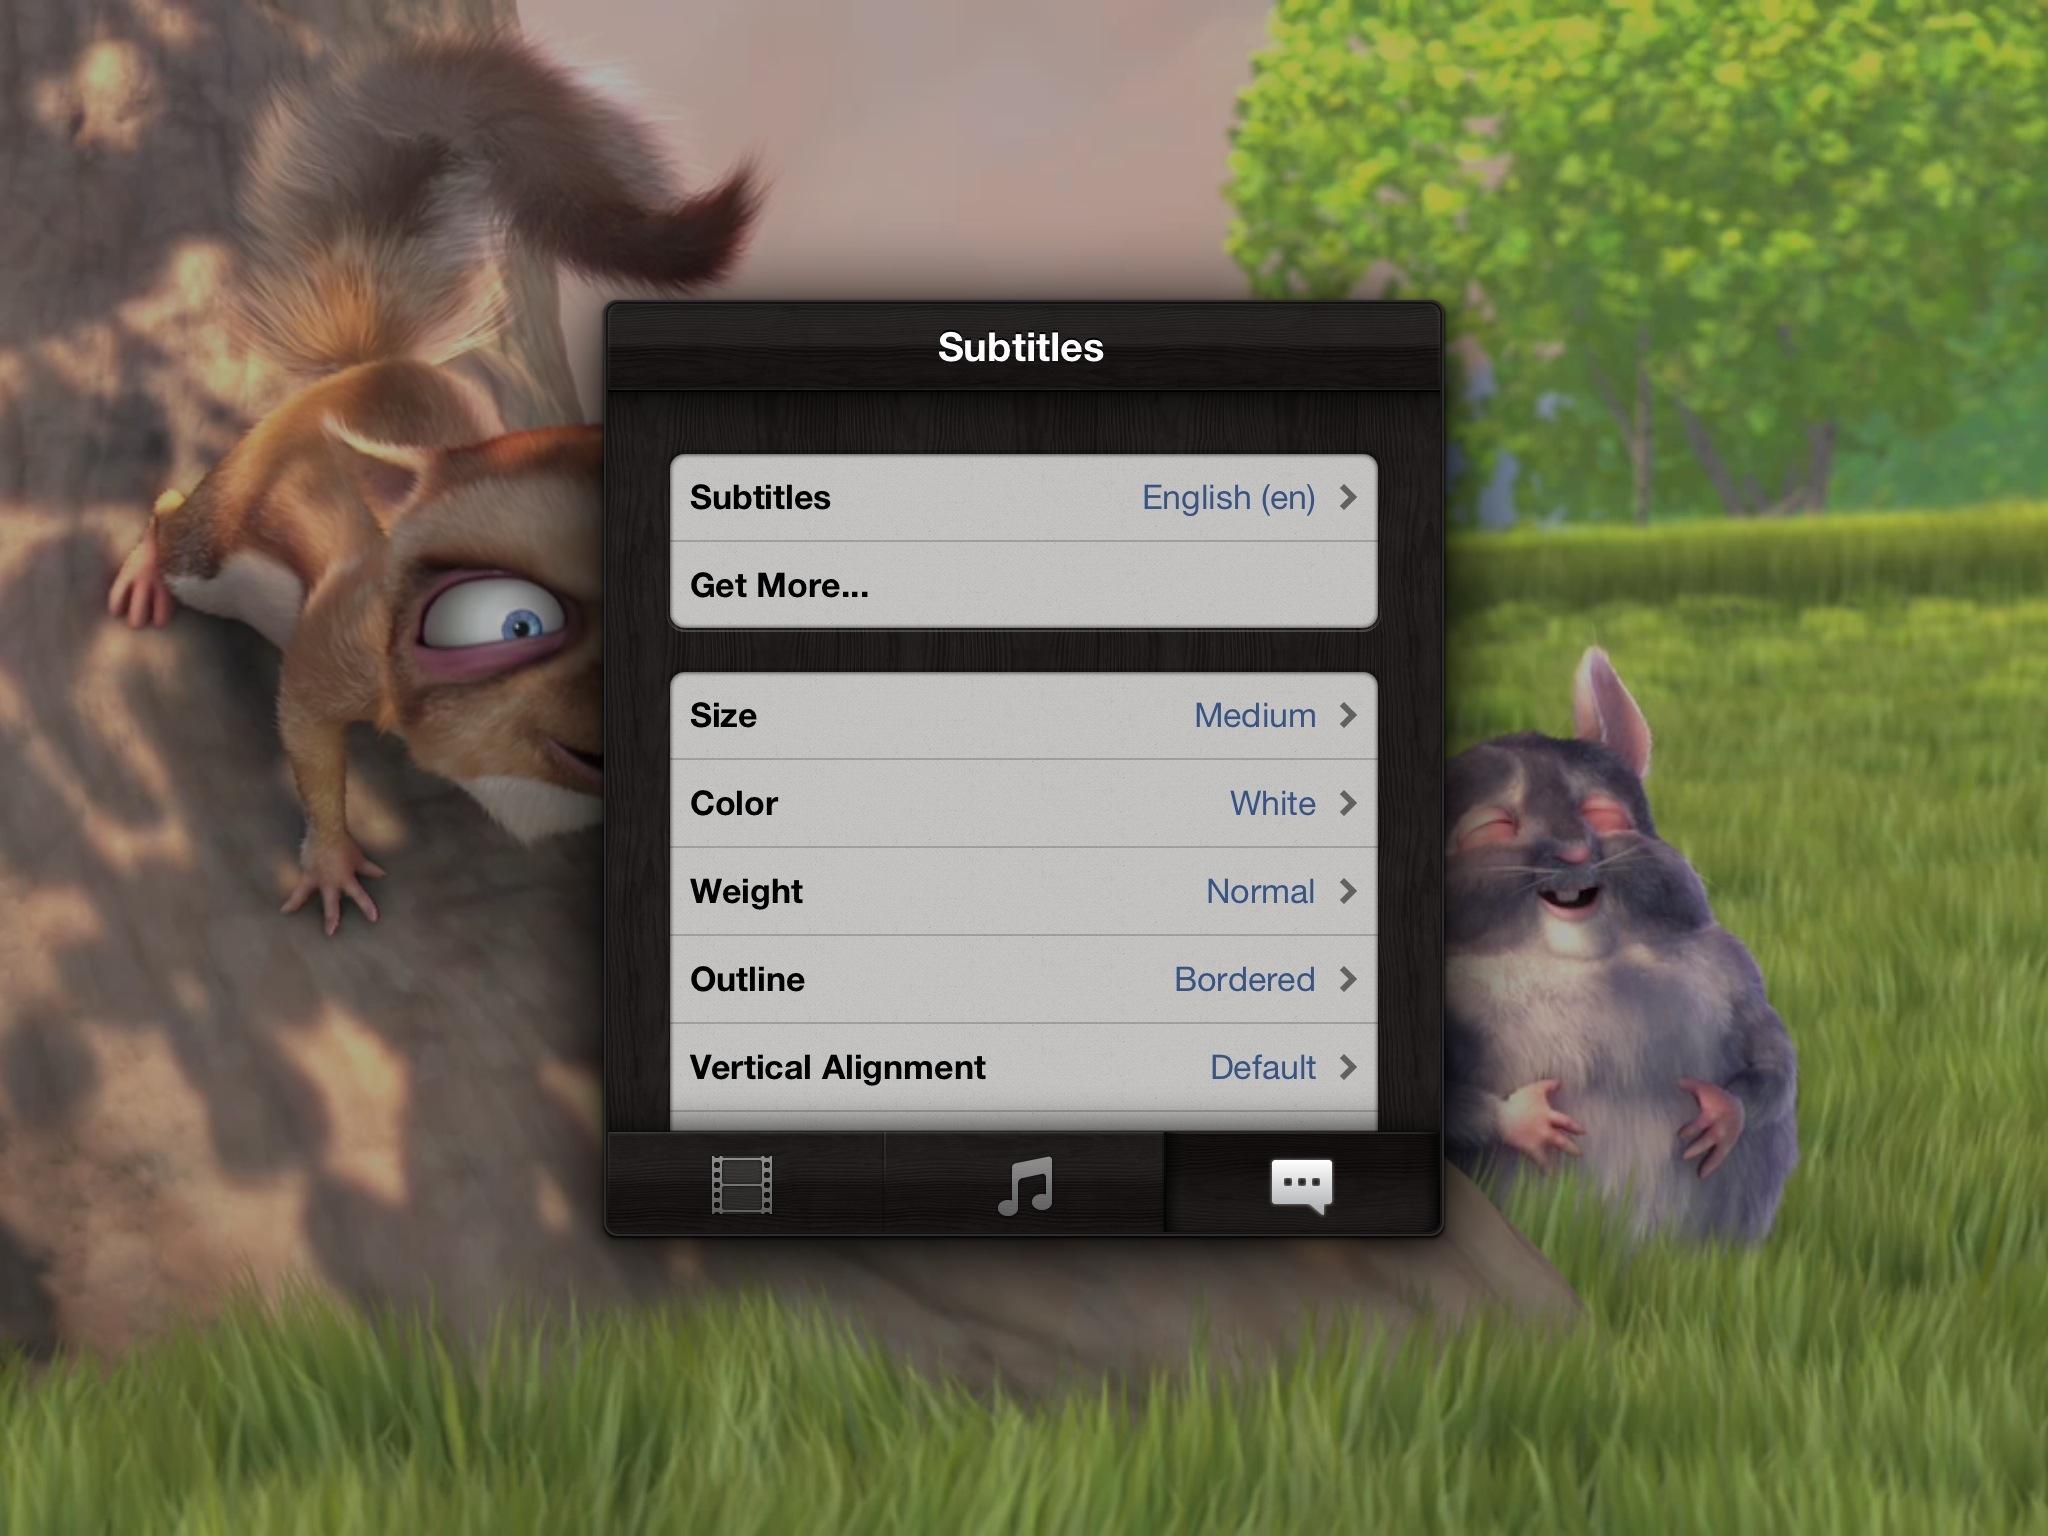 Infuse 1.3 for iOS (iPad subtitles)